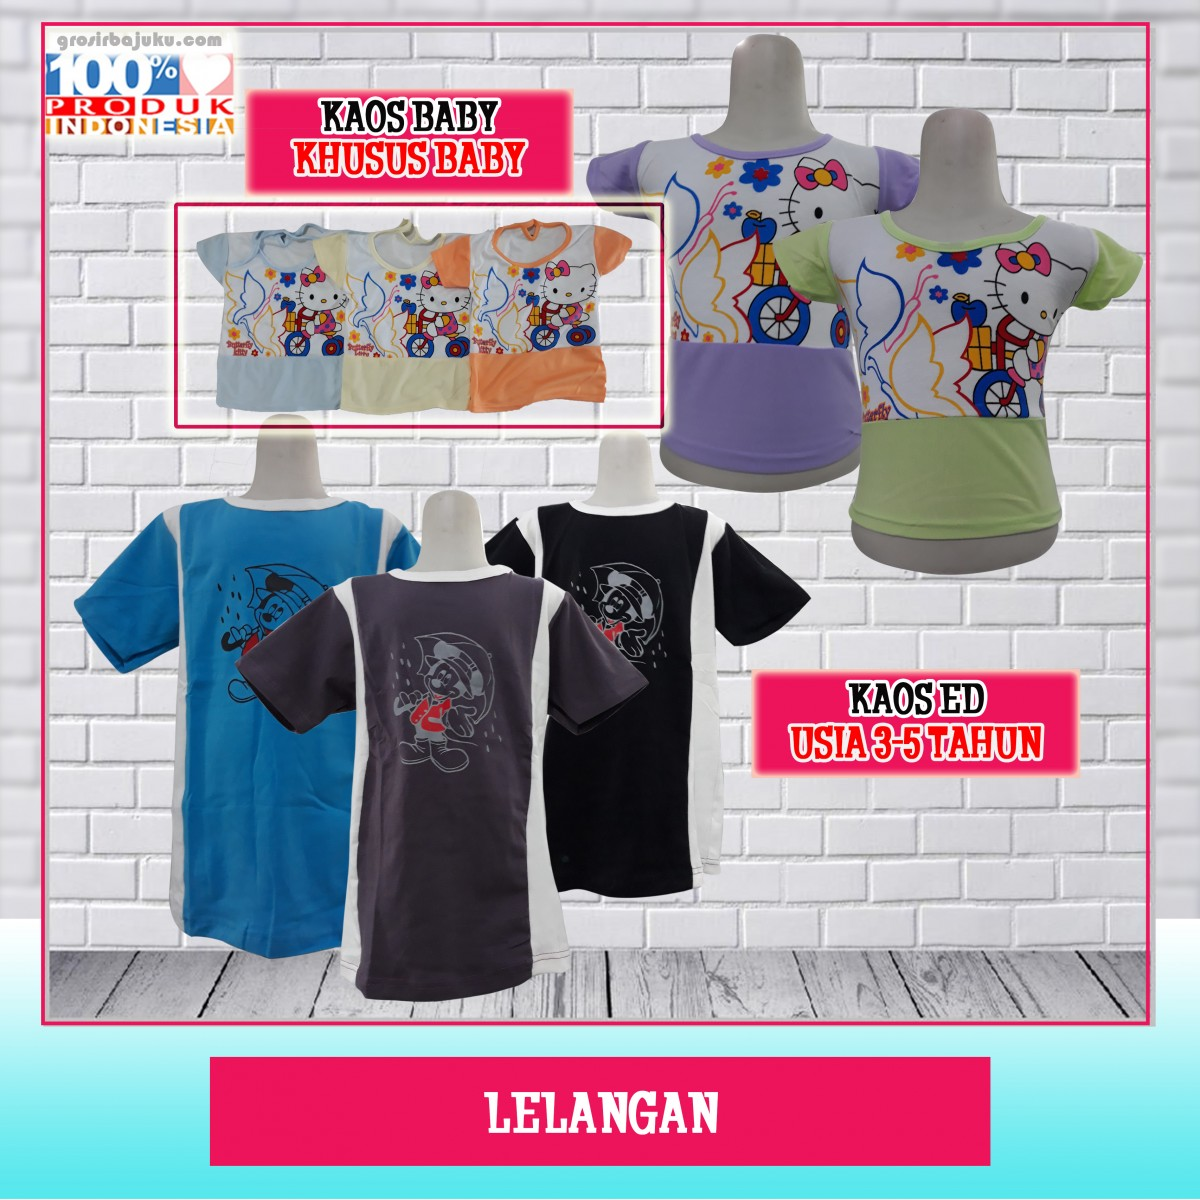 Pusat Grosir Baju Murah Solo Klewer 2021 Grosir Kaos ED & Kaos Baby Murah di Solo